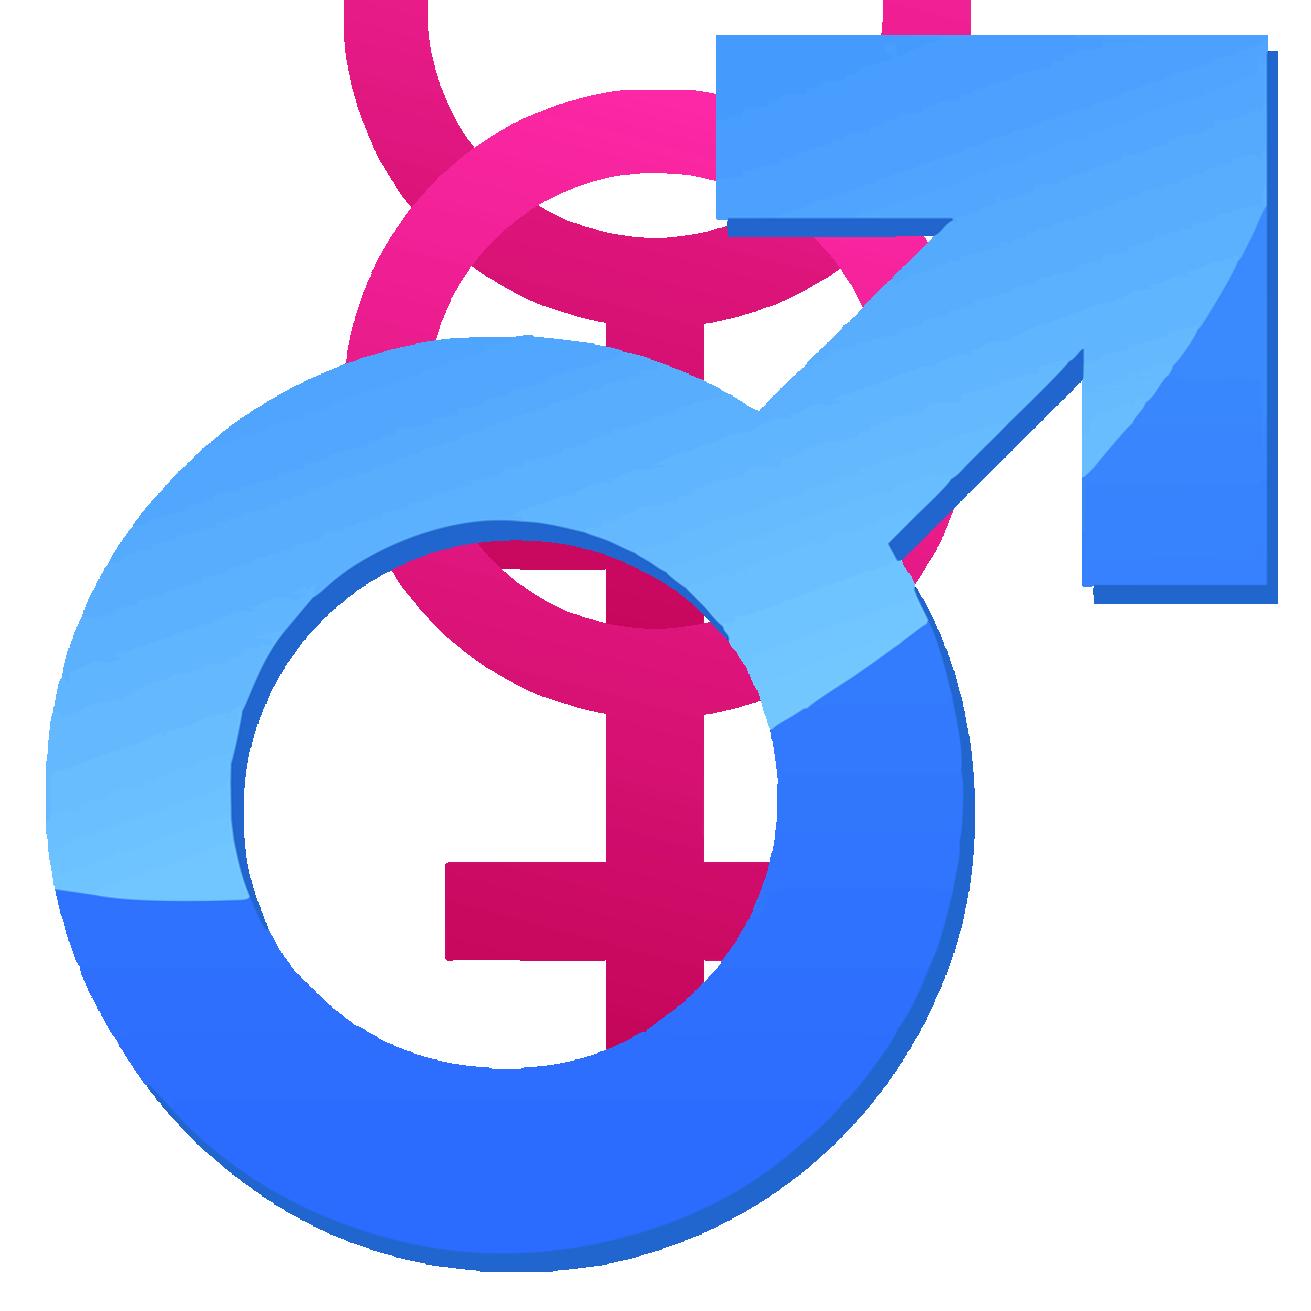 Free Mens Symbol, Download Free Clip Art, Free Clip Art on Clipart.